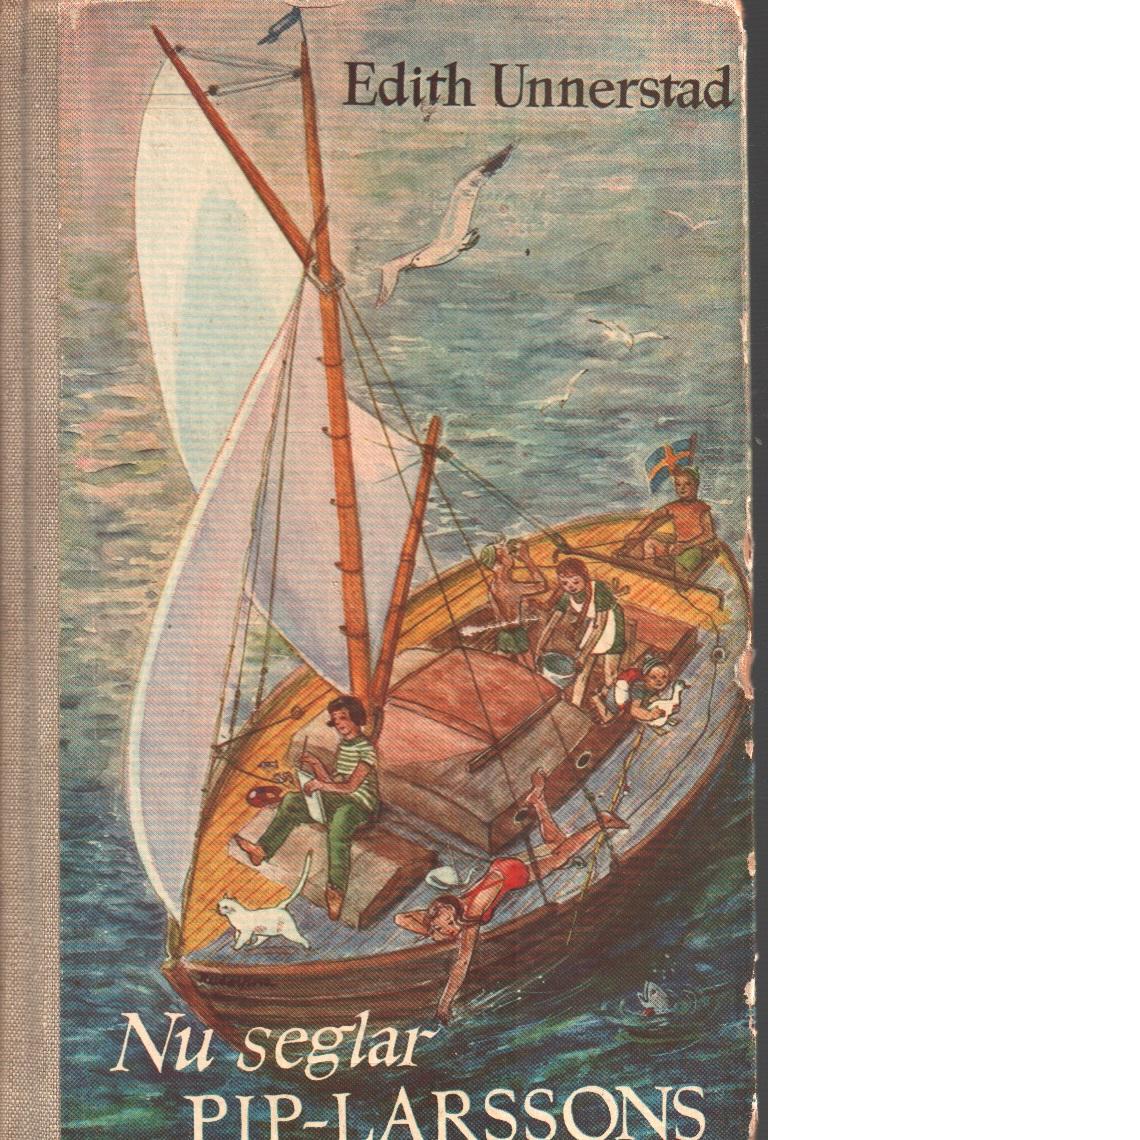 Nu seglar Pip-Larssons - Unnerstad, Edith